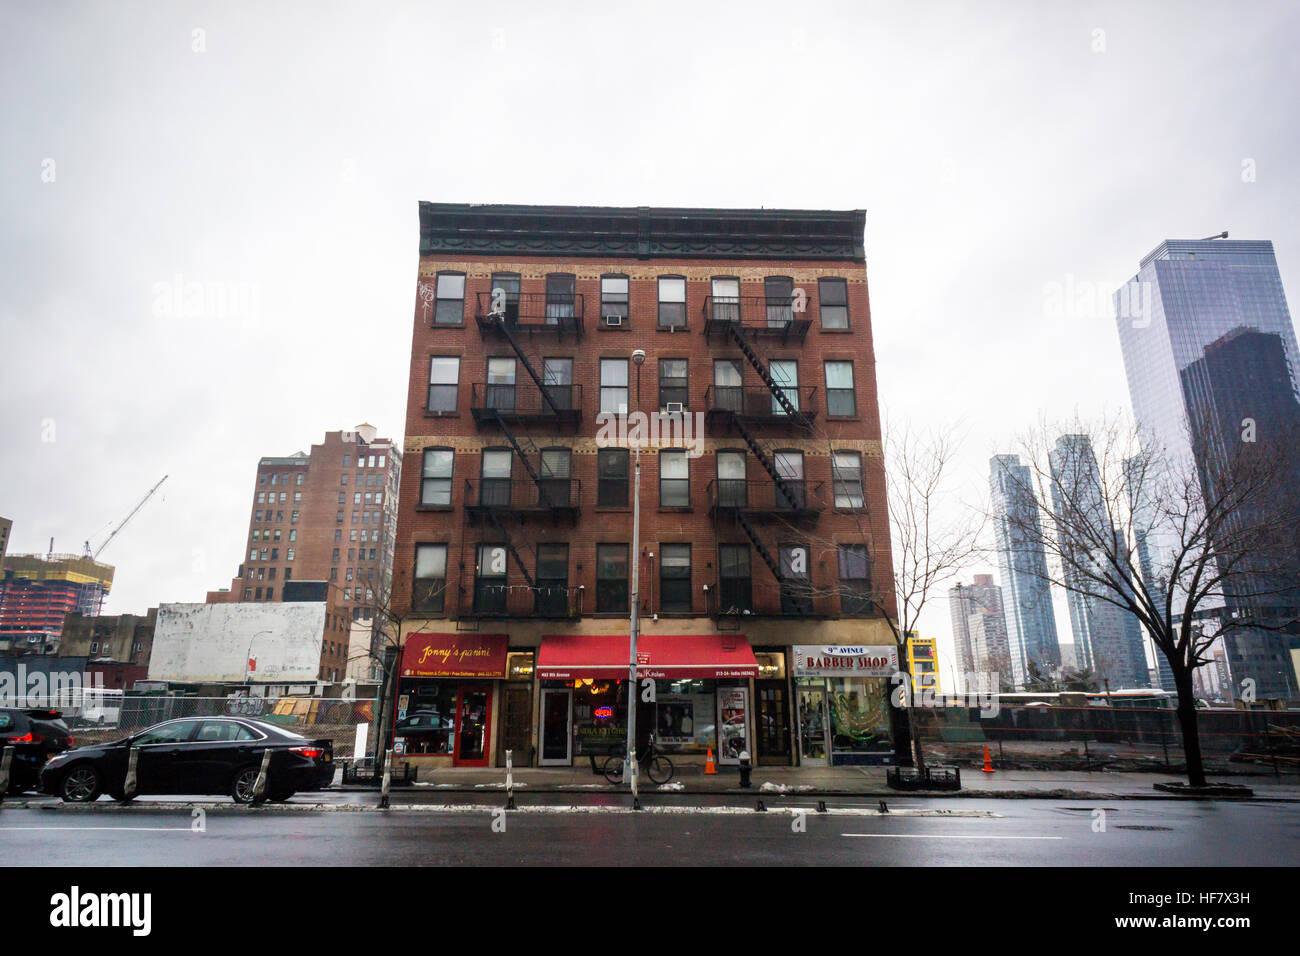 Tenement Usa Stockfotos & Tenement Usa Bilder - Seite 2 - Alamy